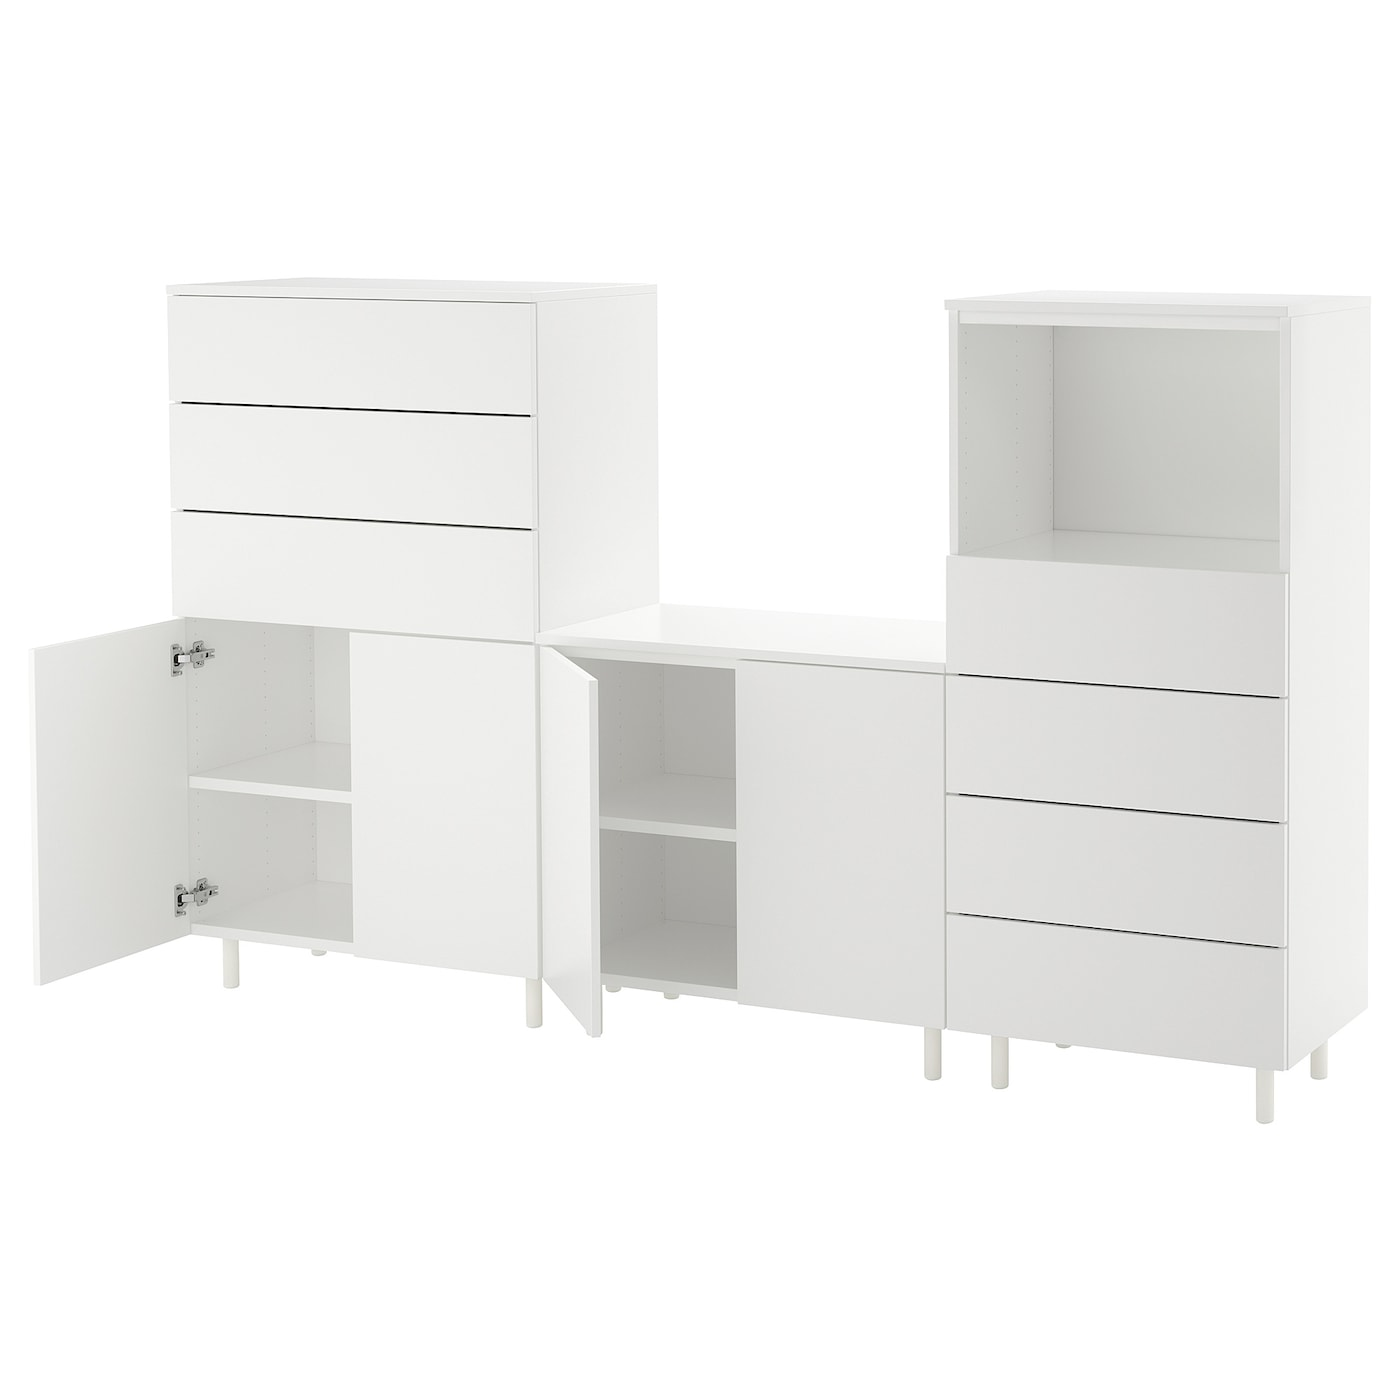 Platsa ikea - Ikea armarios modulares ...